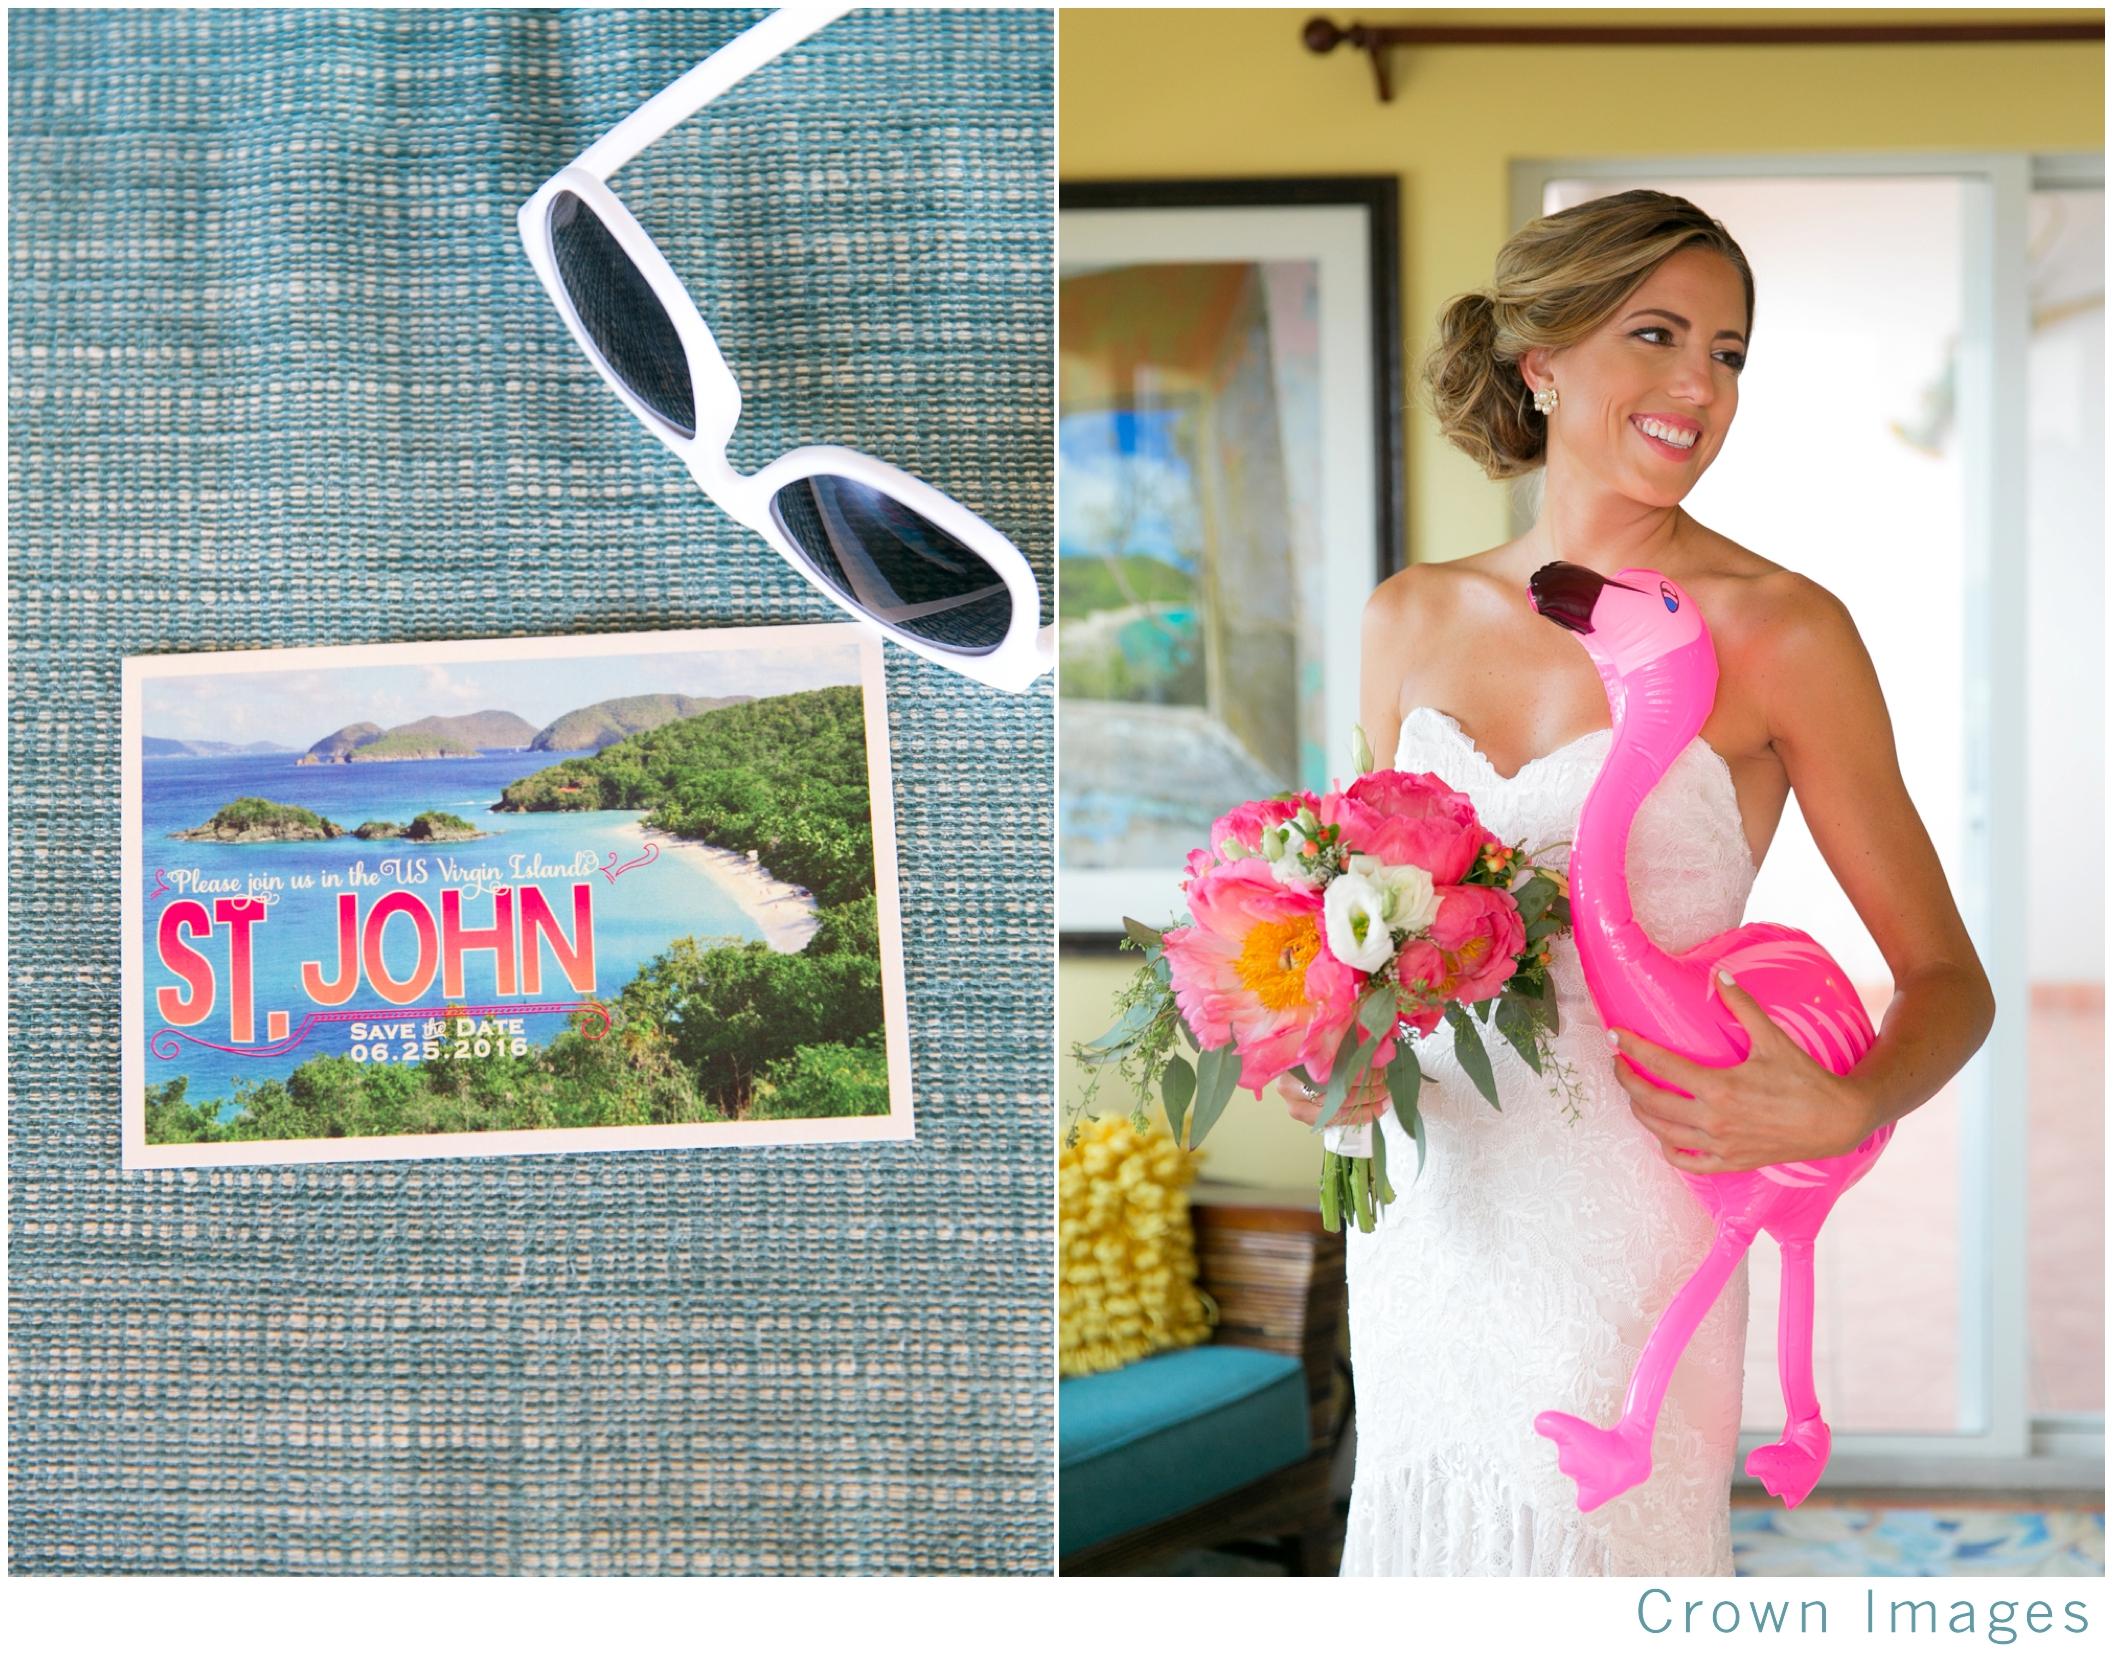 st john wedding photos crown images_1639.jpg